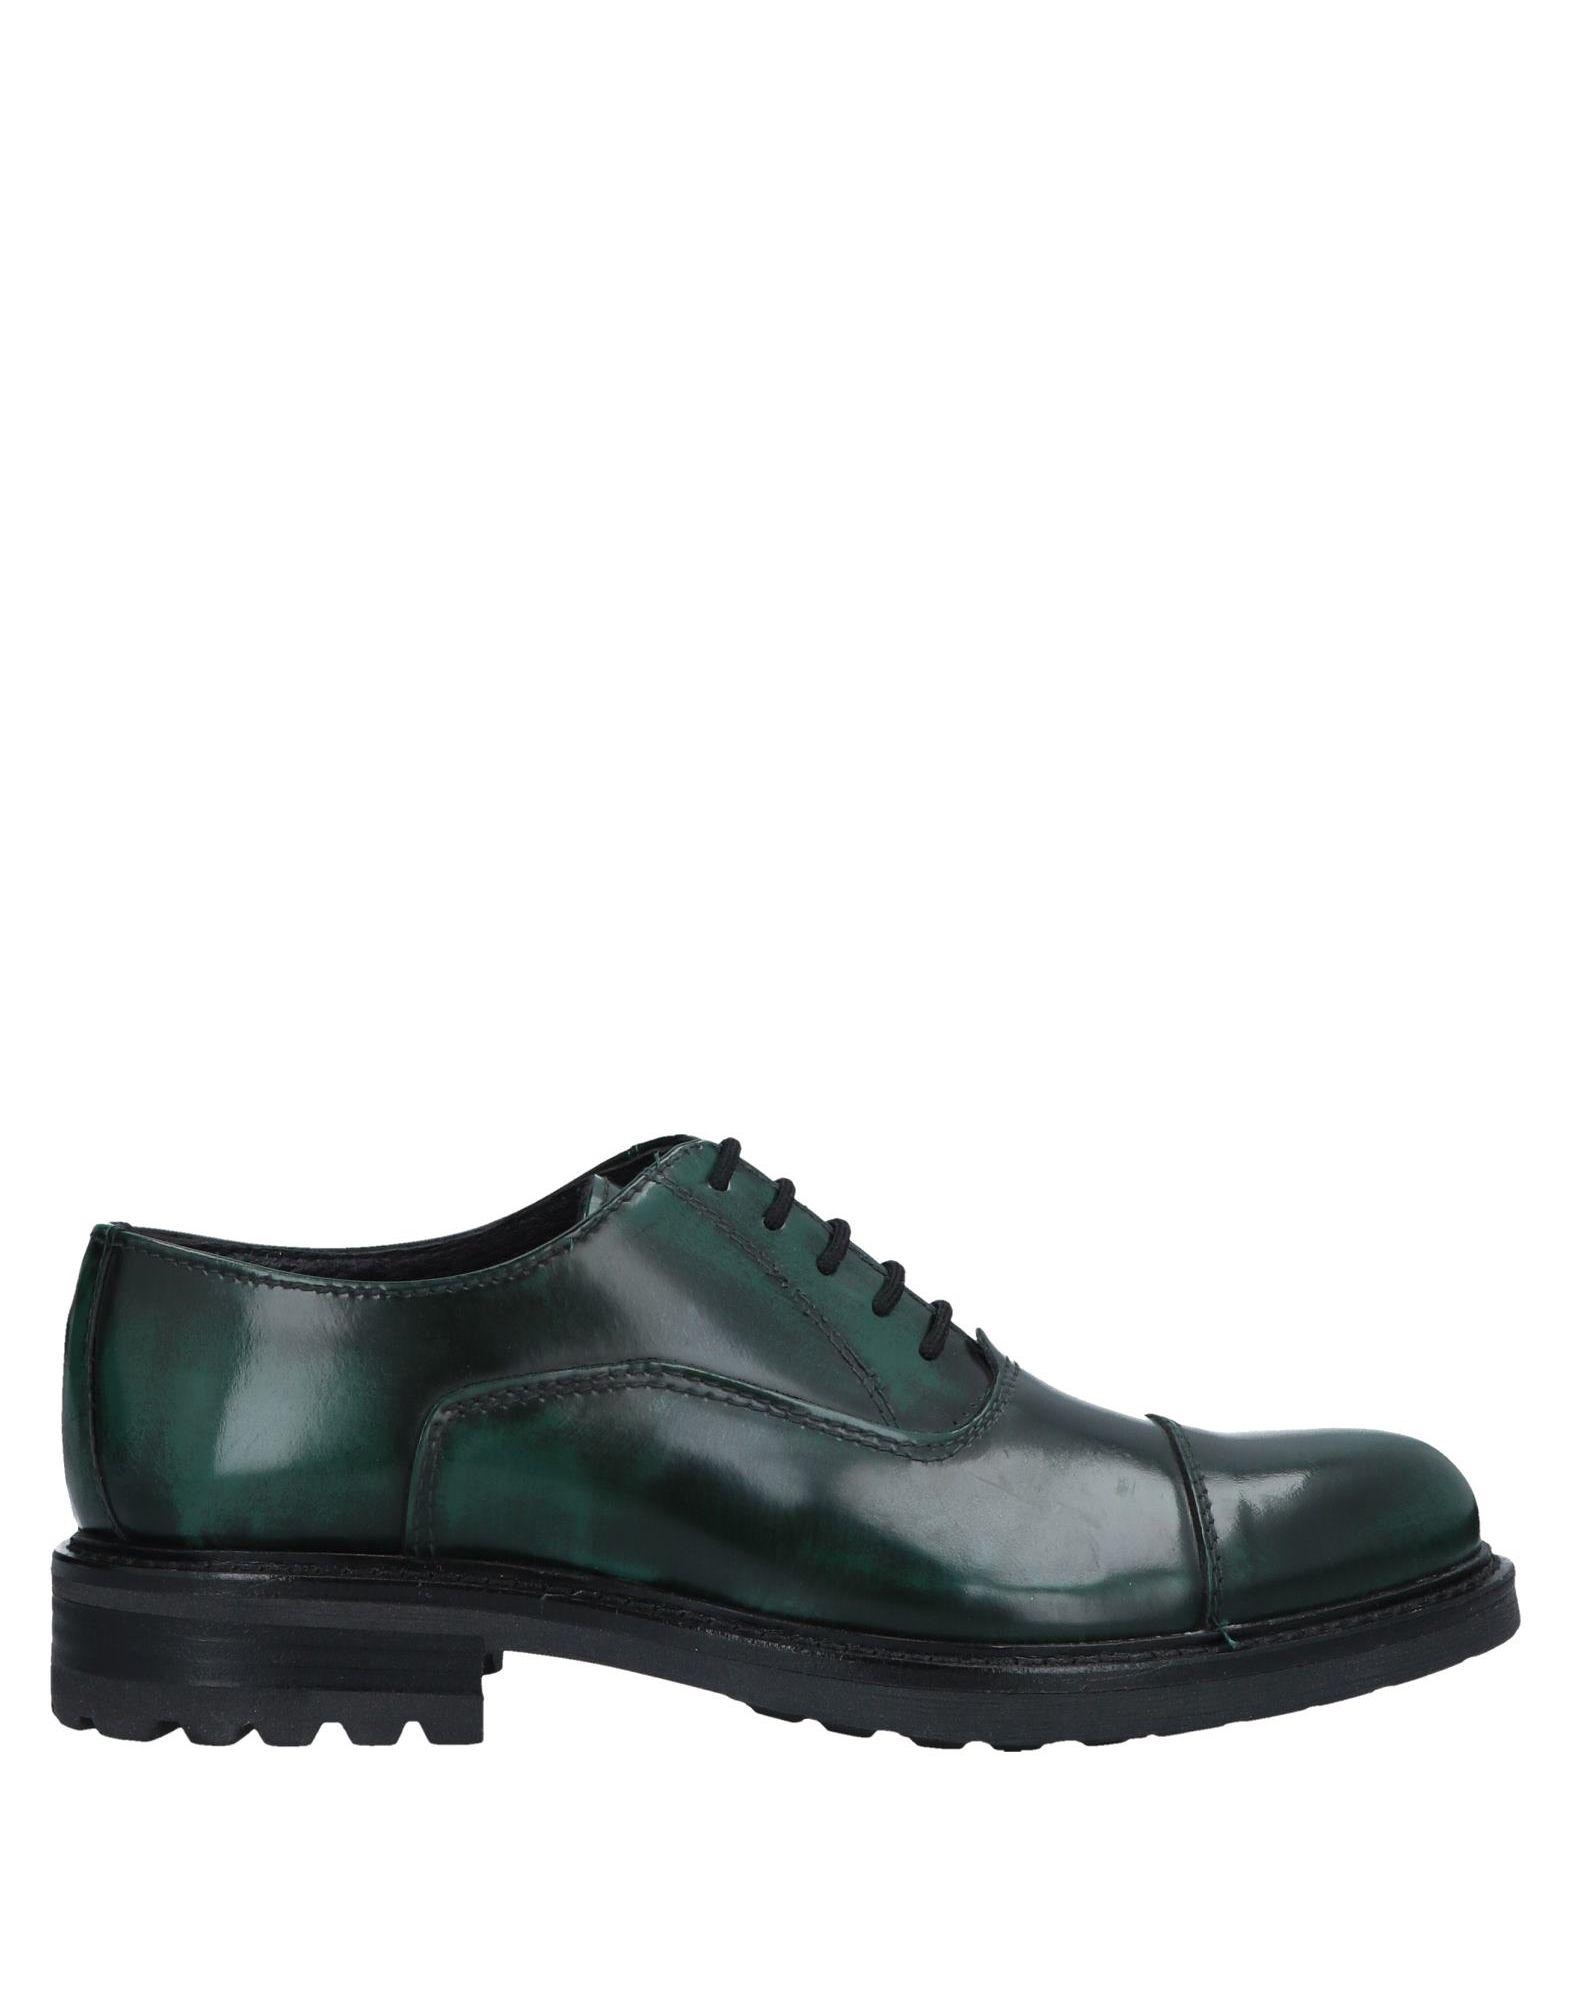 REPORTER Обувь на шнурках обувь на высокой платформе its own brand 116 31 32 33